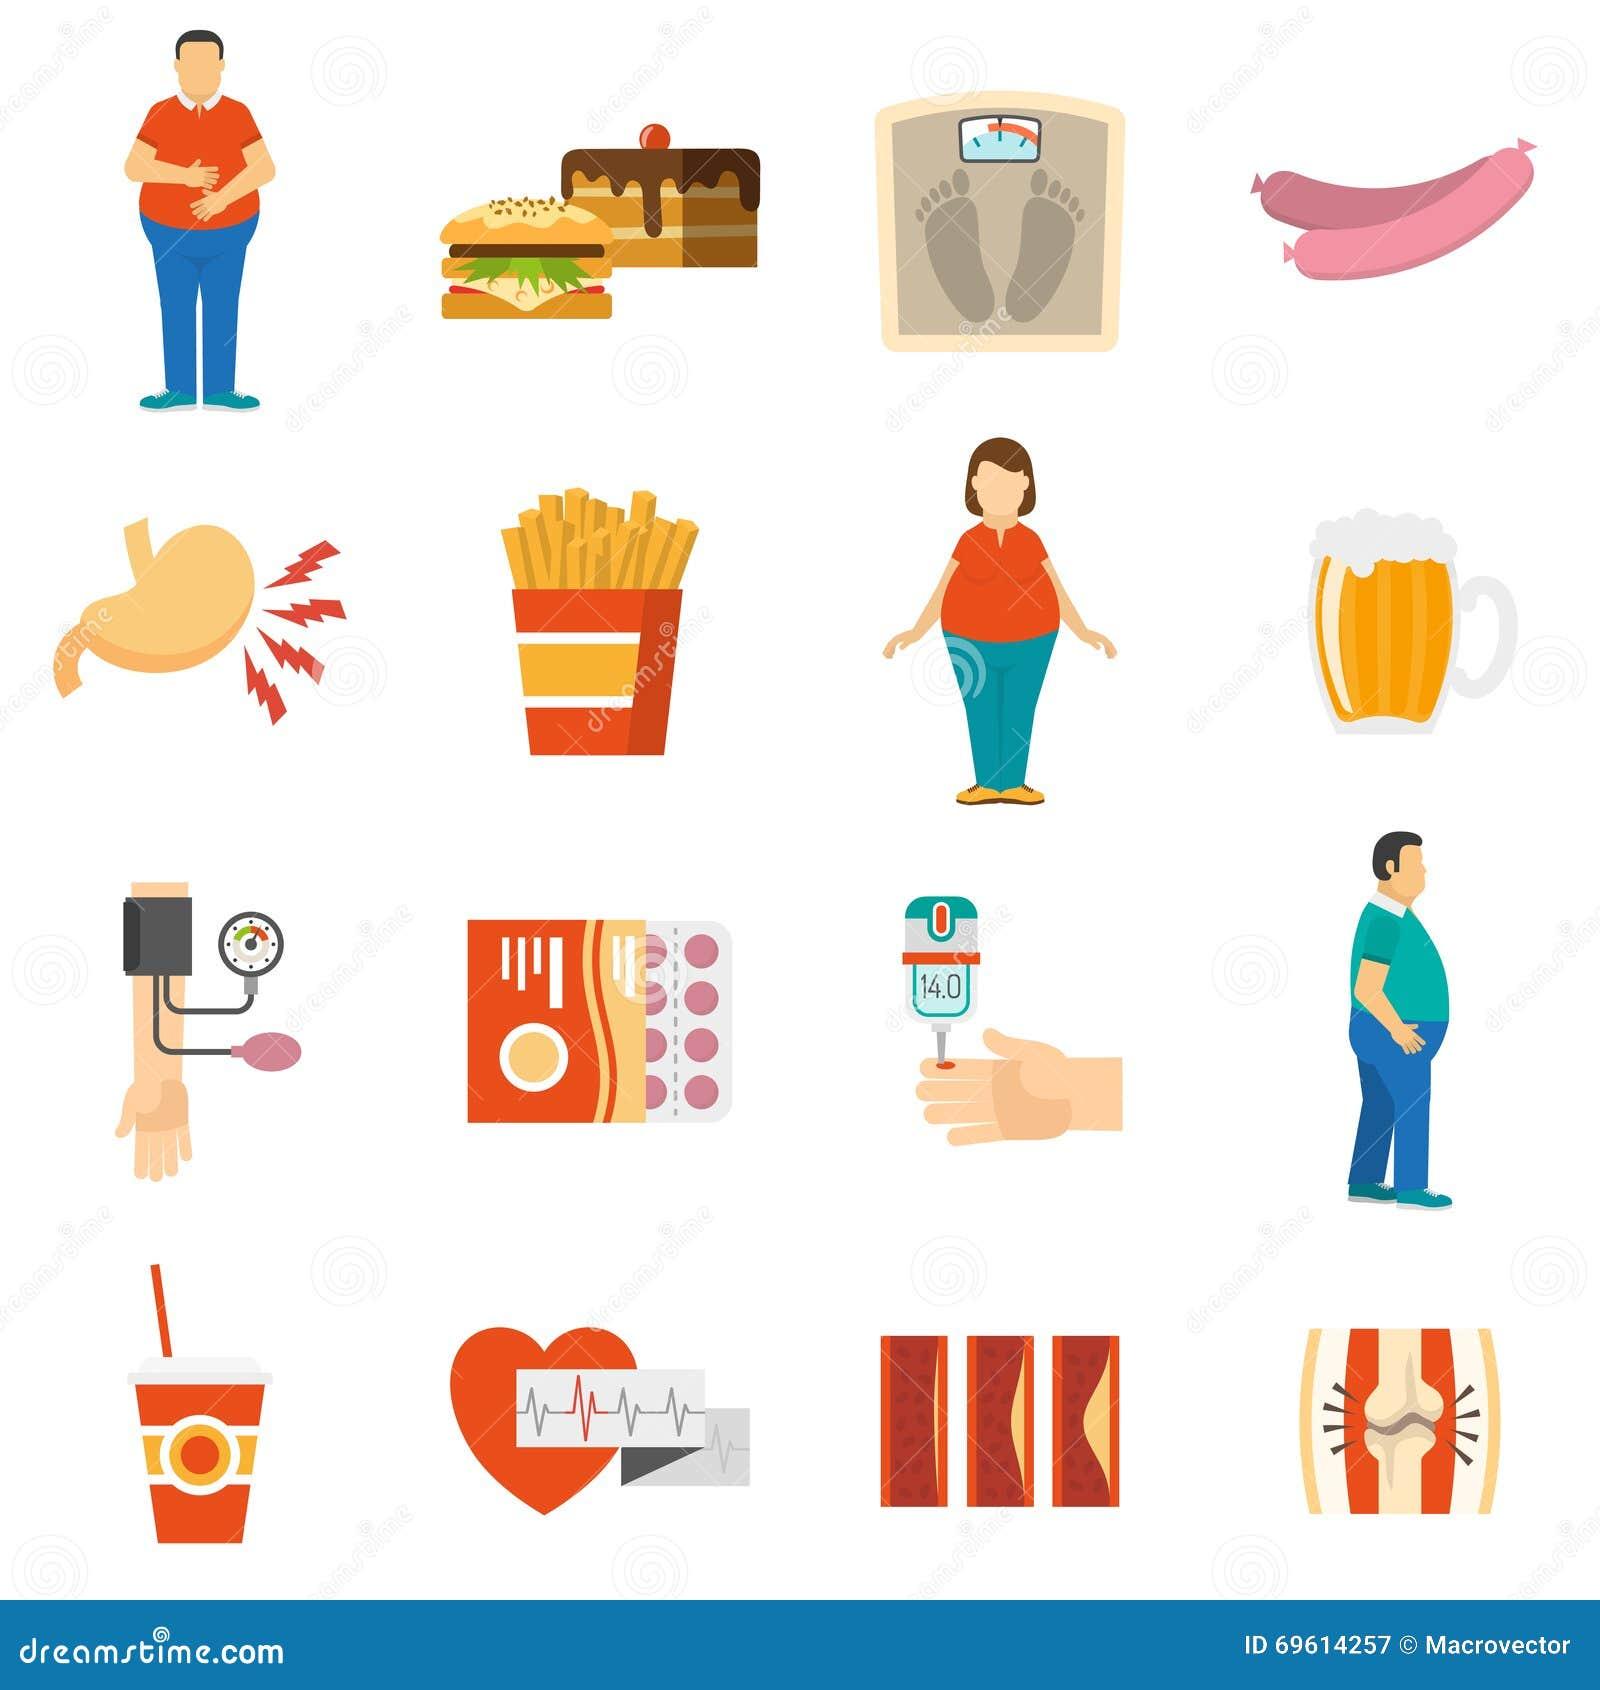 obesity icons collection cartoon vector cartoondealer